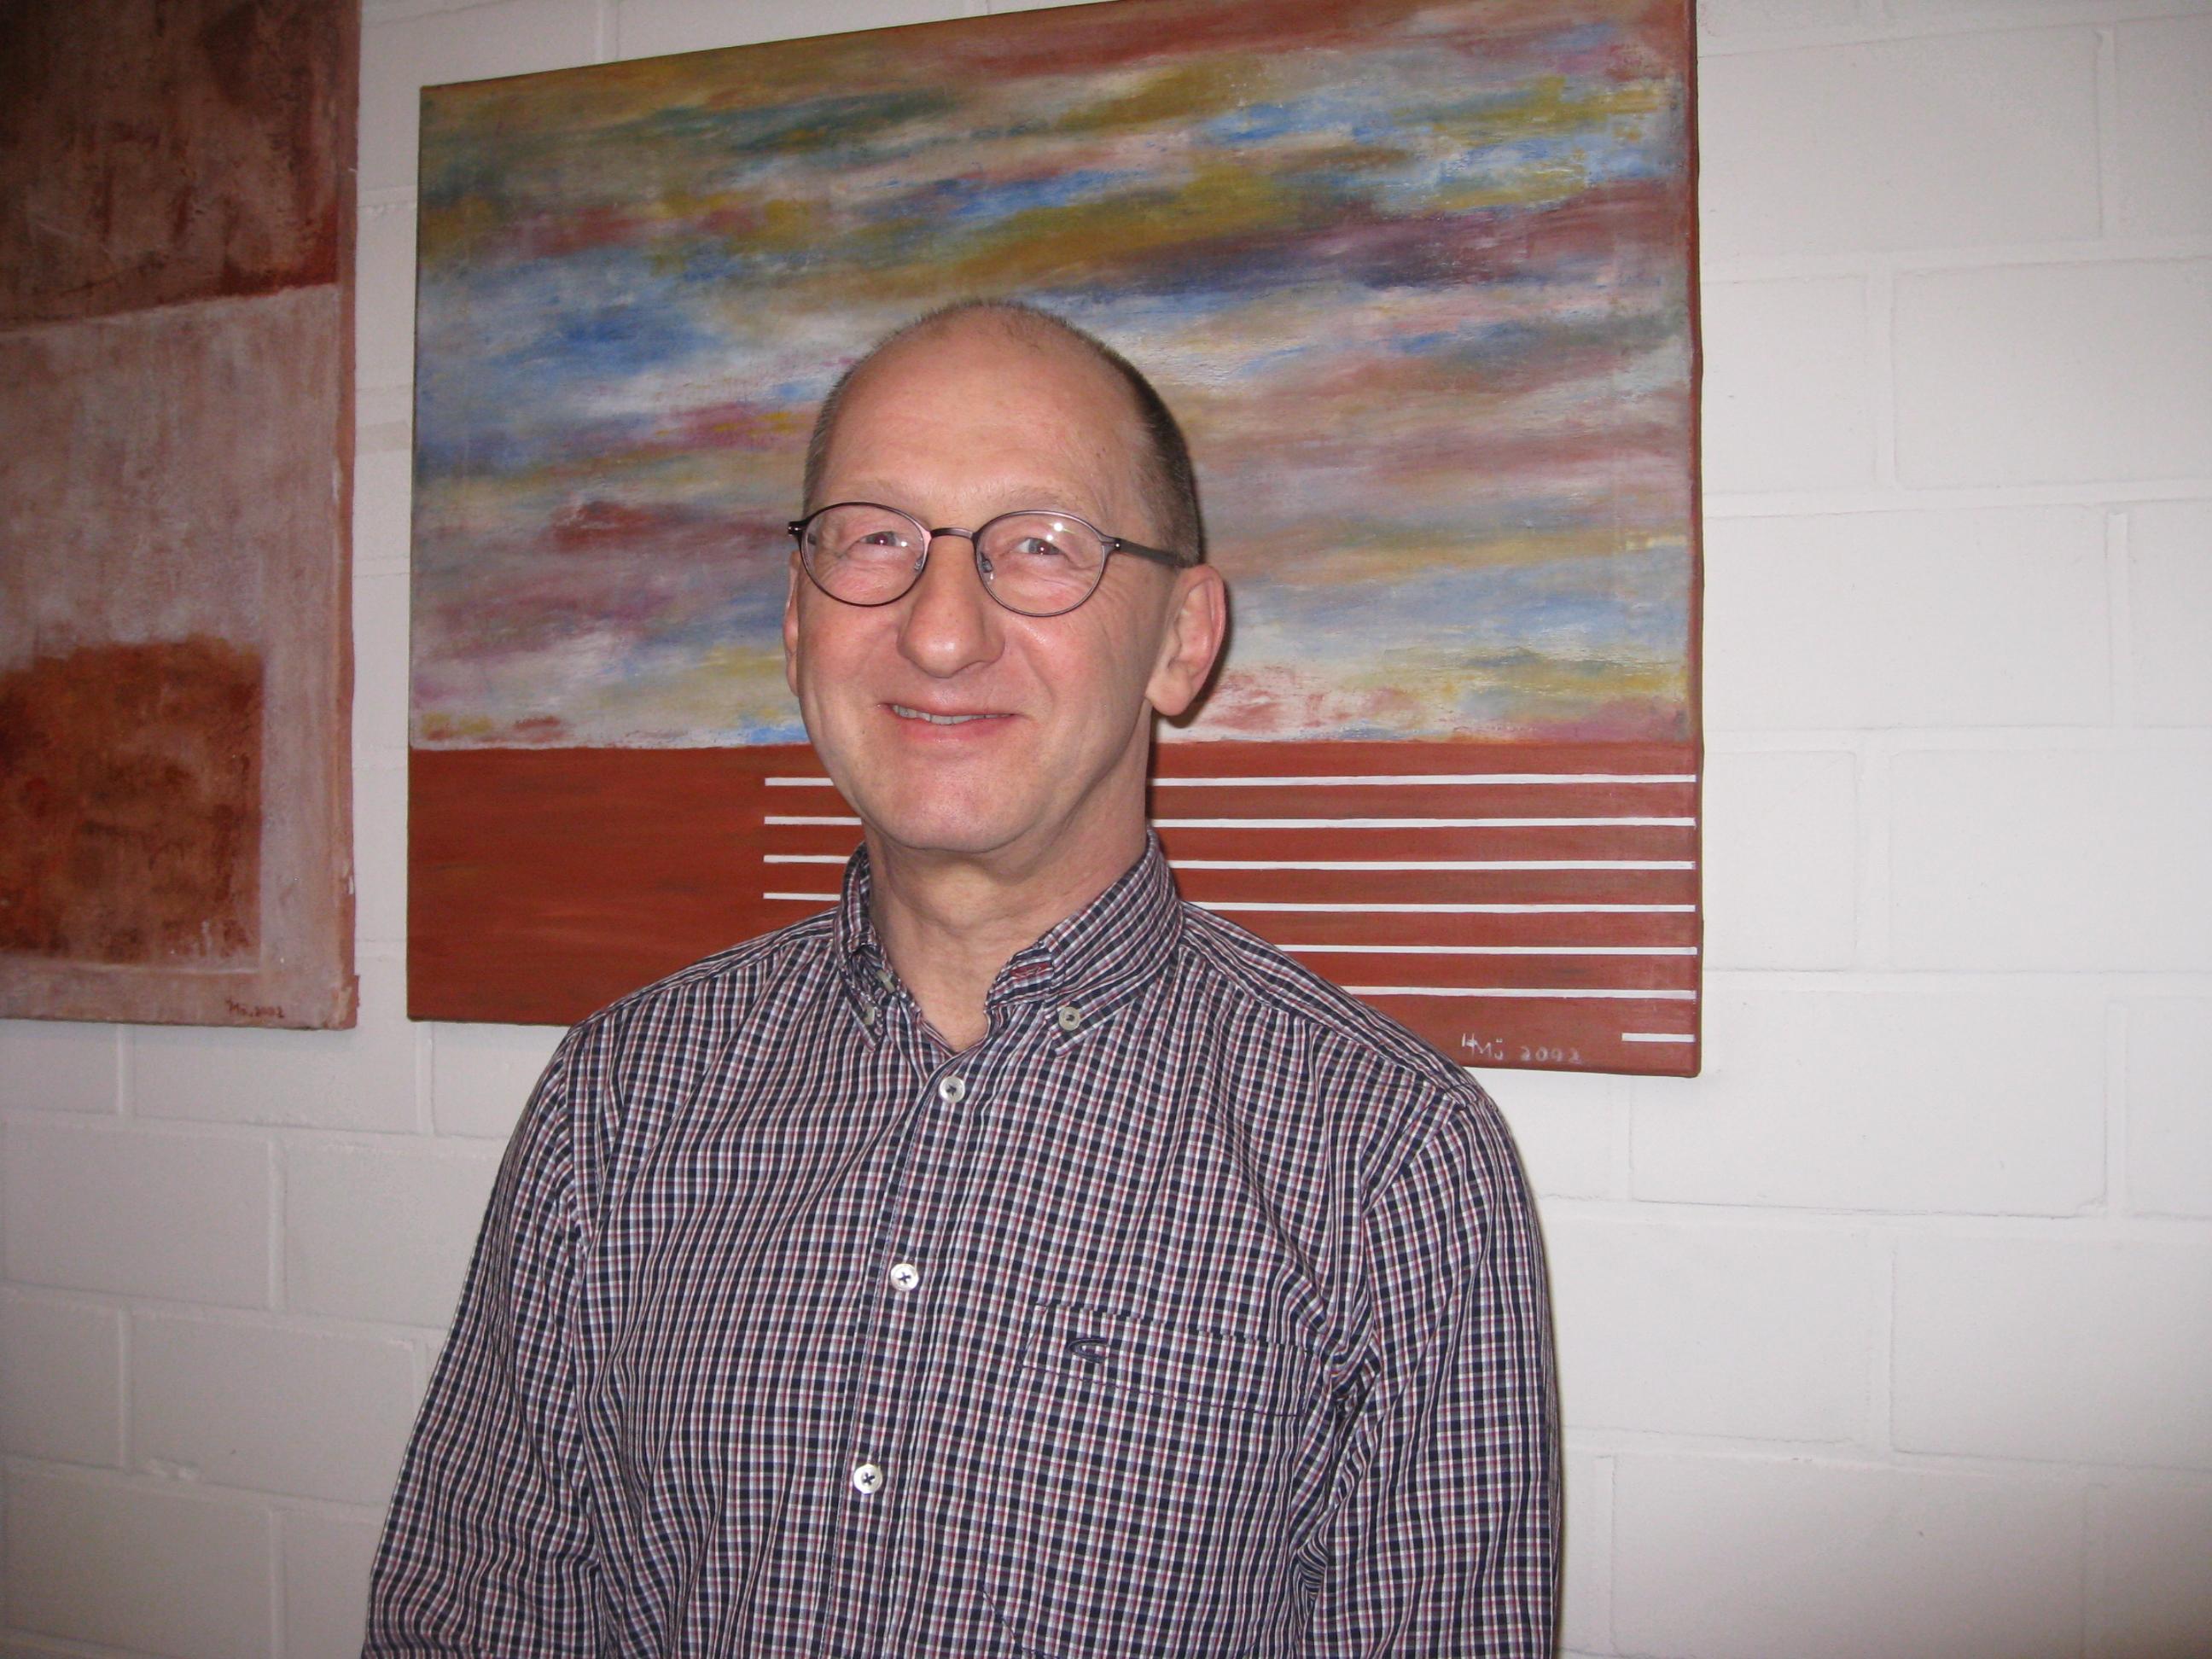 Dirk Brandenburg